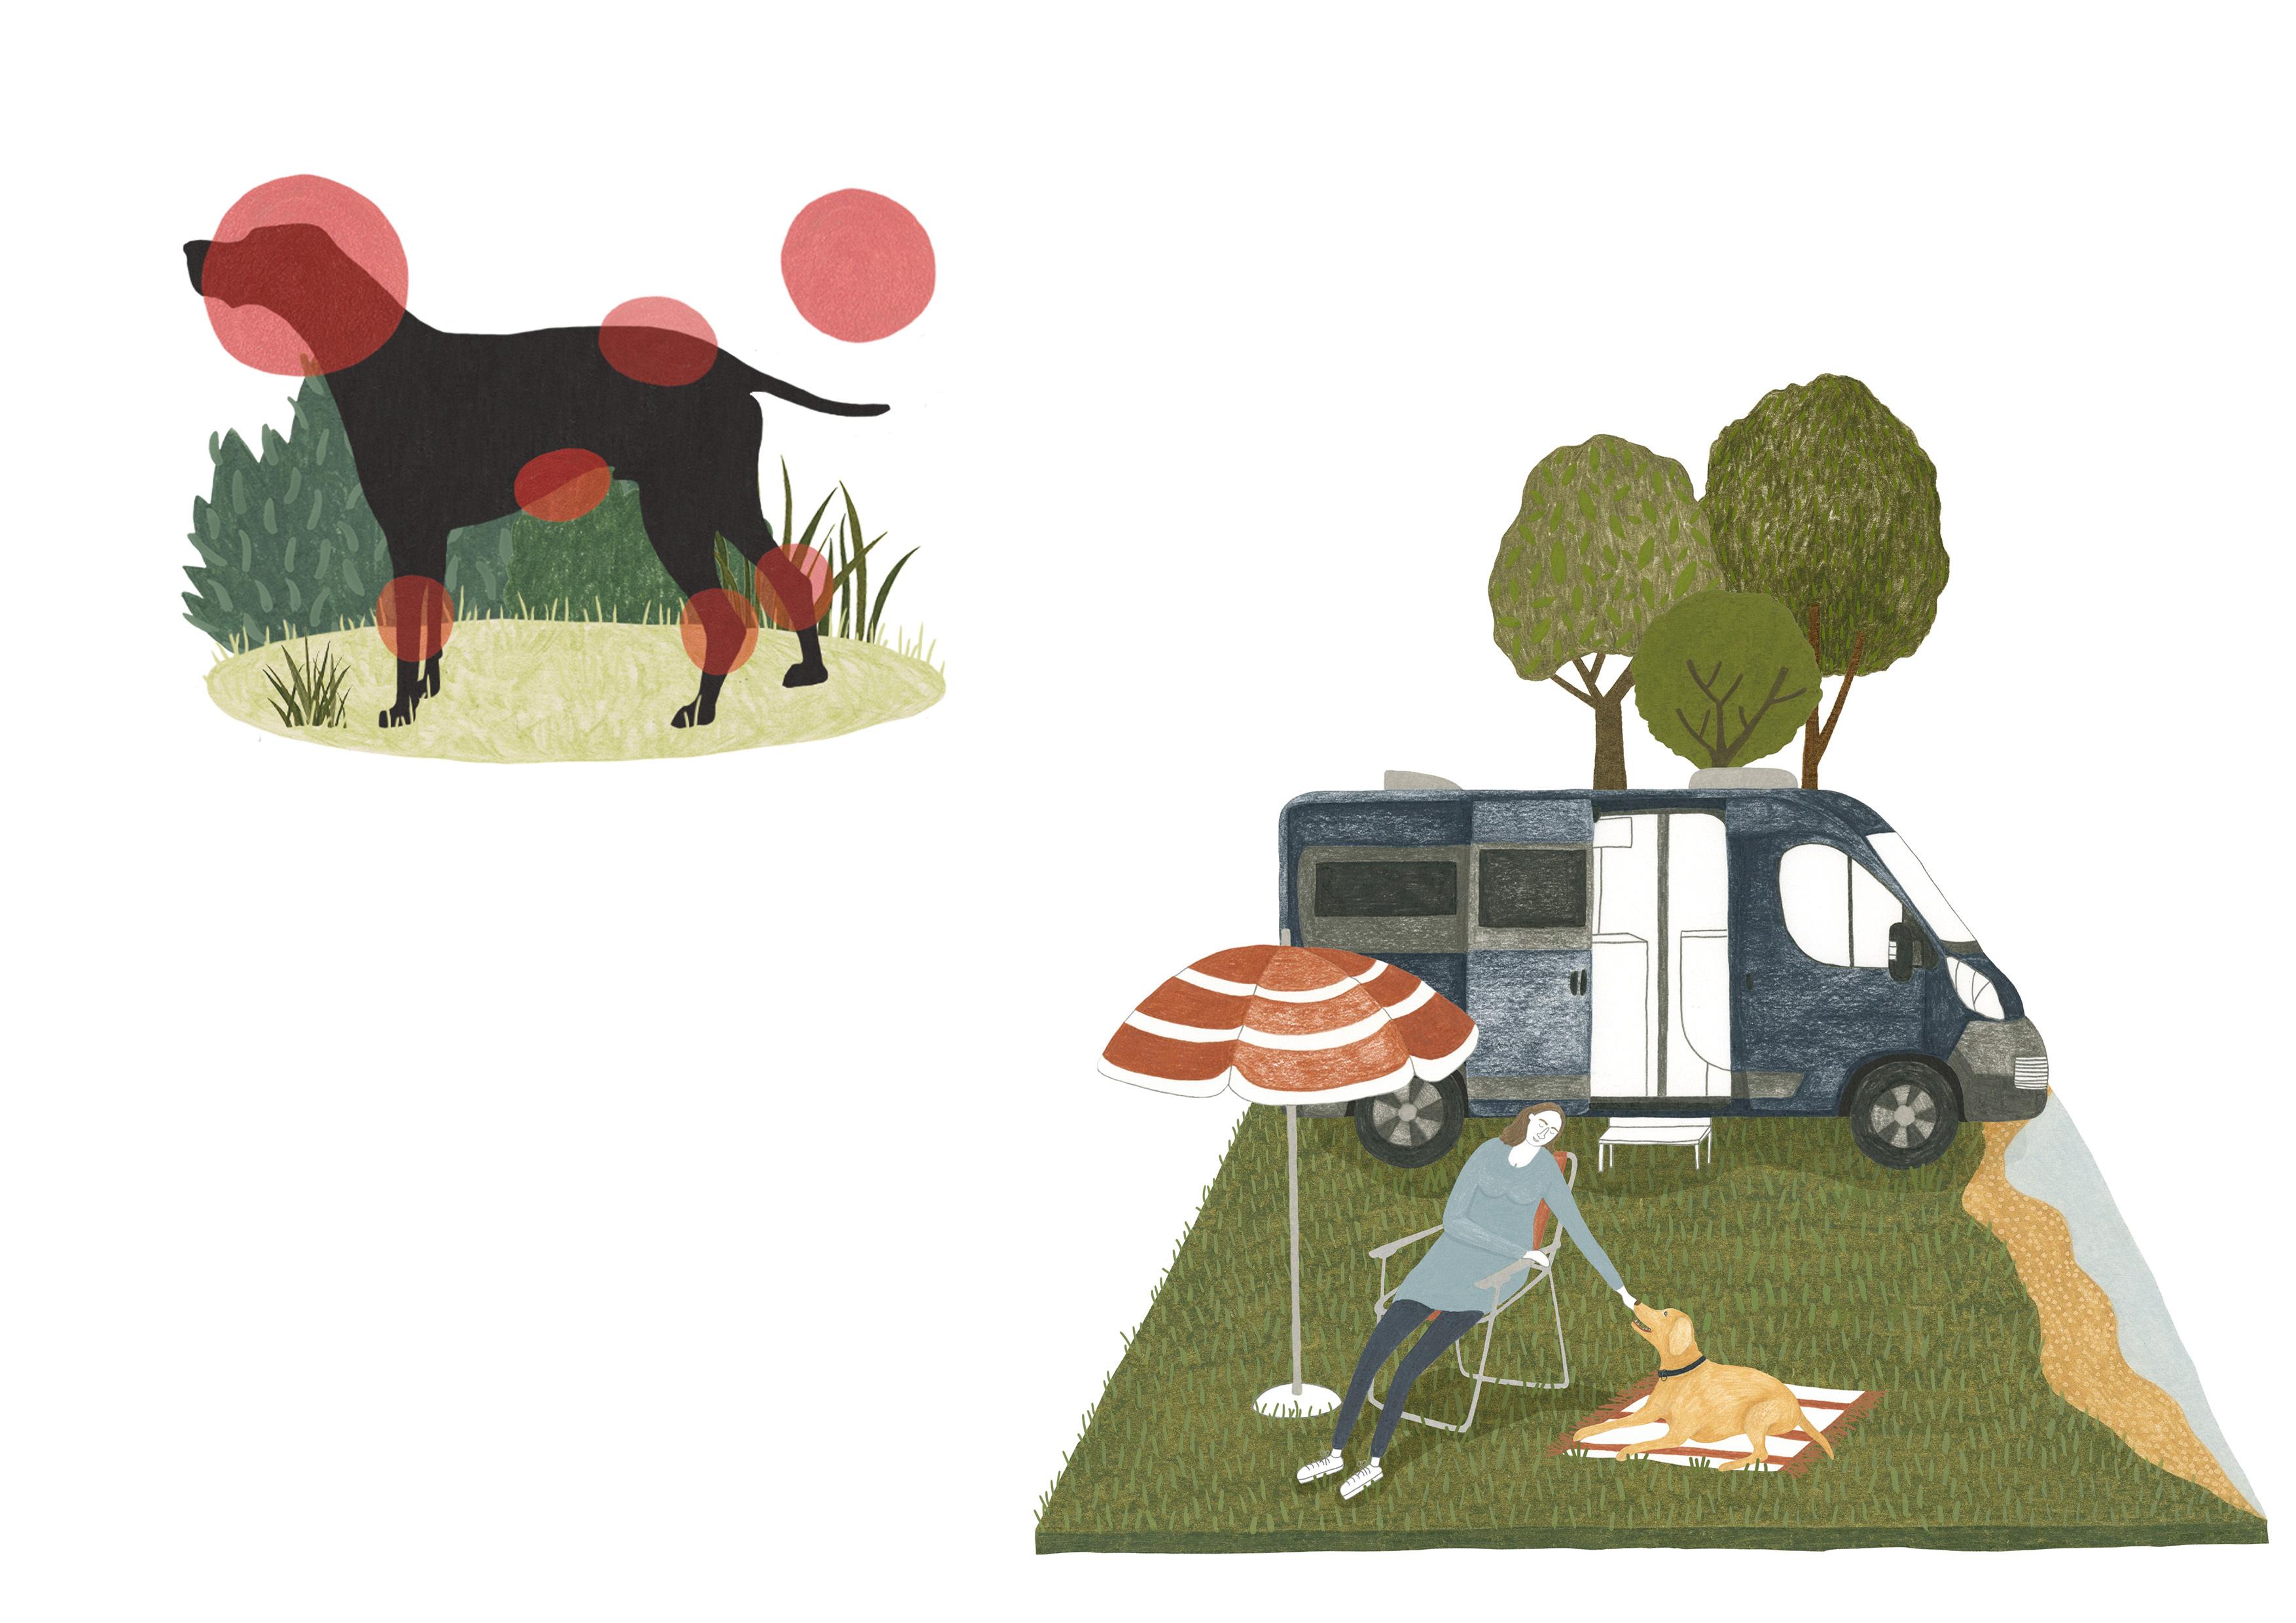 Ticks & Holidays with dogs - Melanie Gandyra Illustration